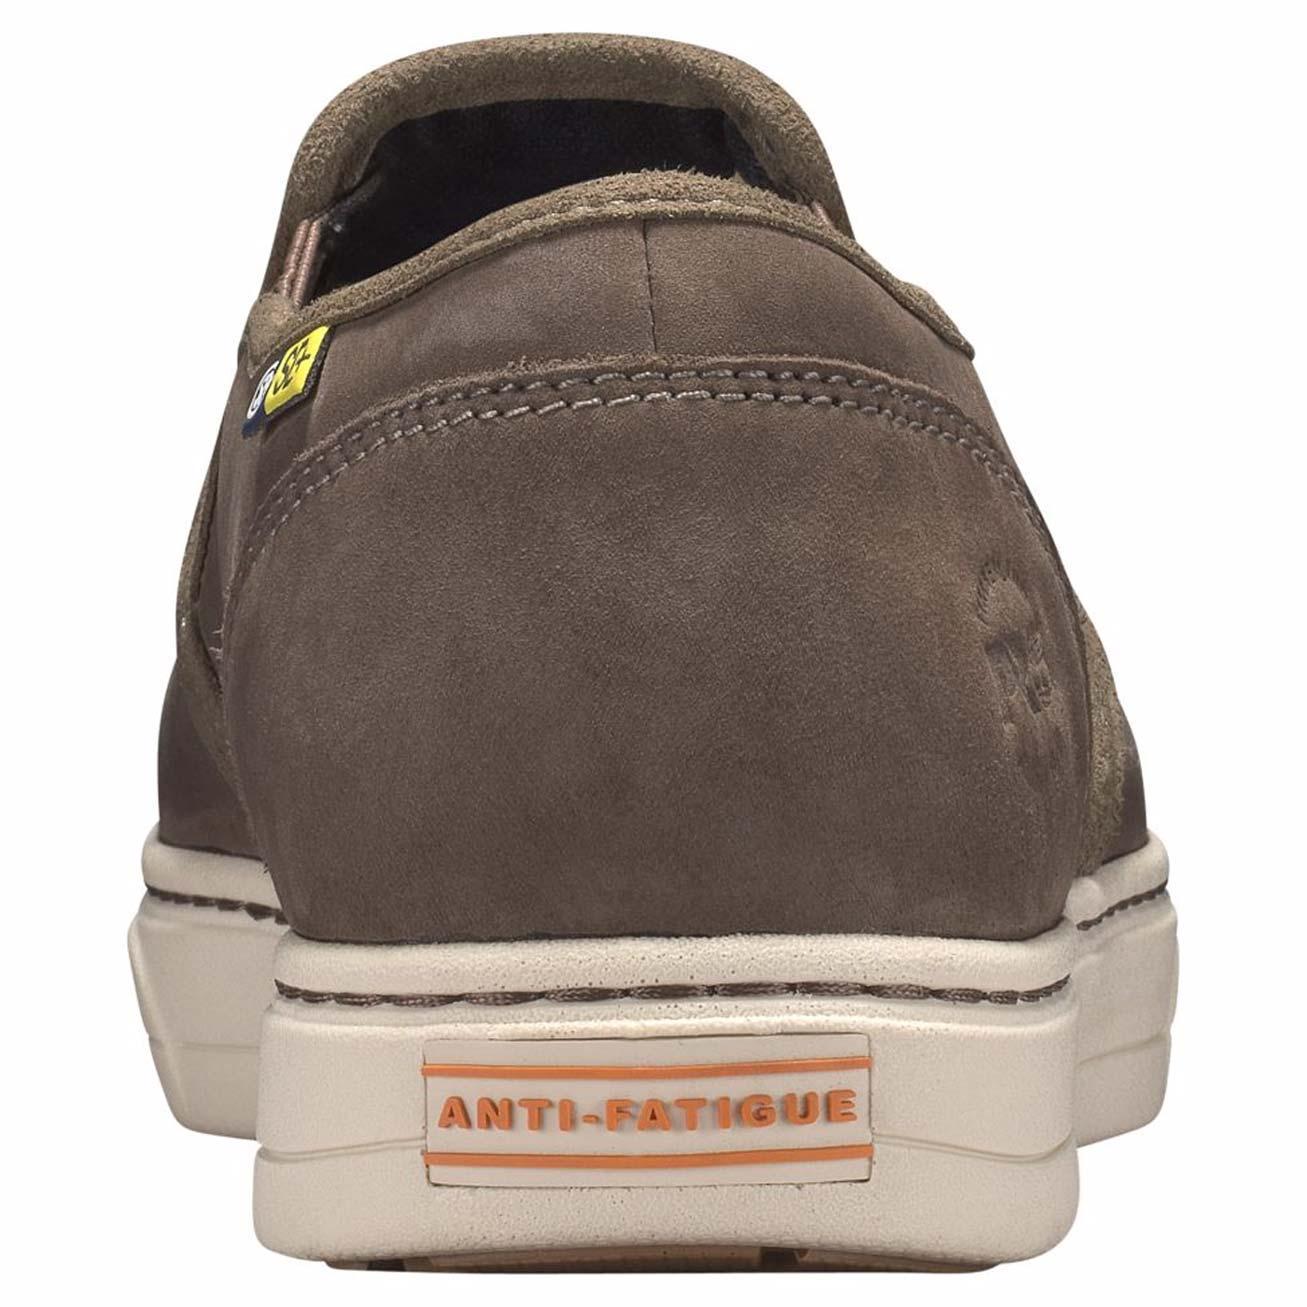 610b706e21e Timberland PRO Disruptor Alloy Toe Static-Dissipative Work Slip-On Shoe